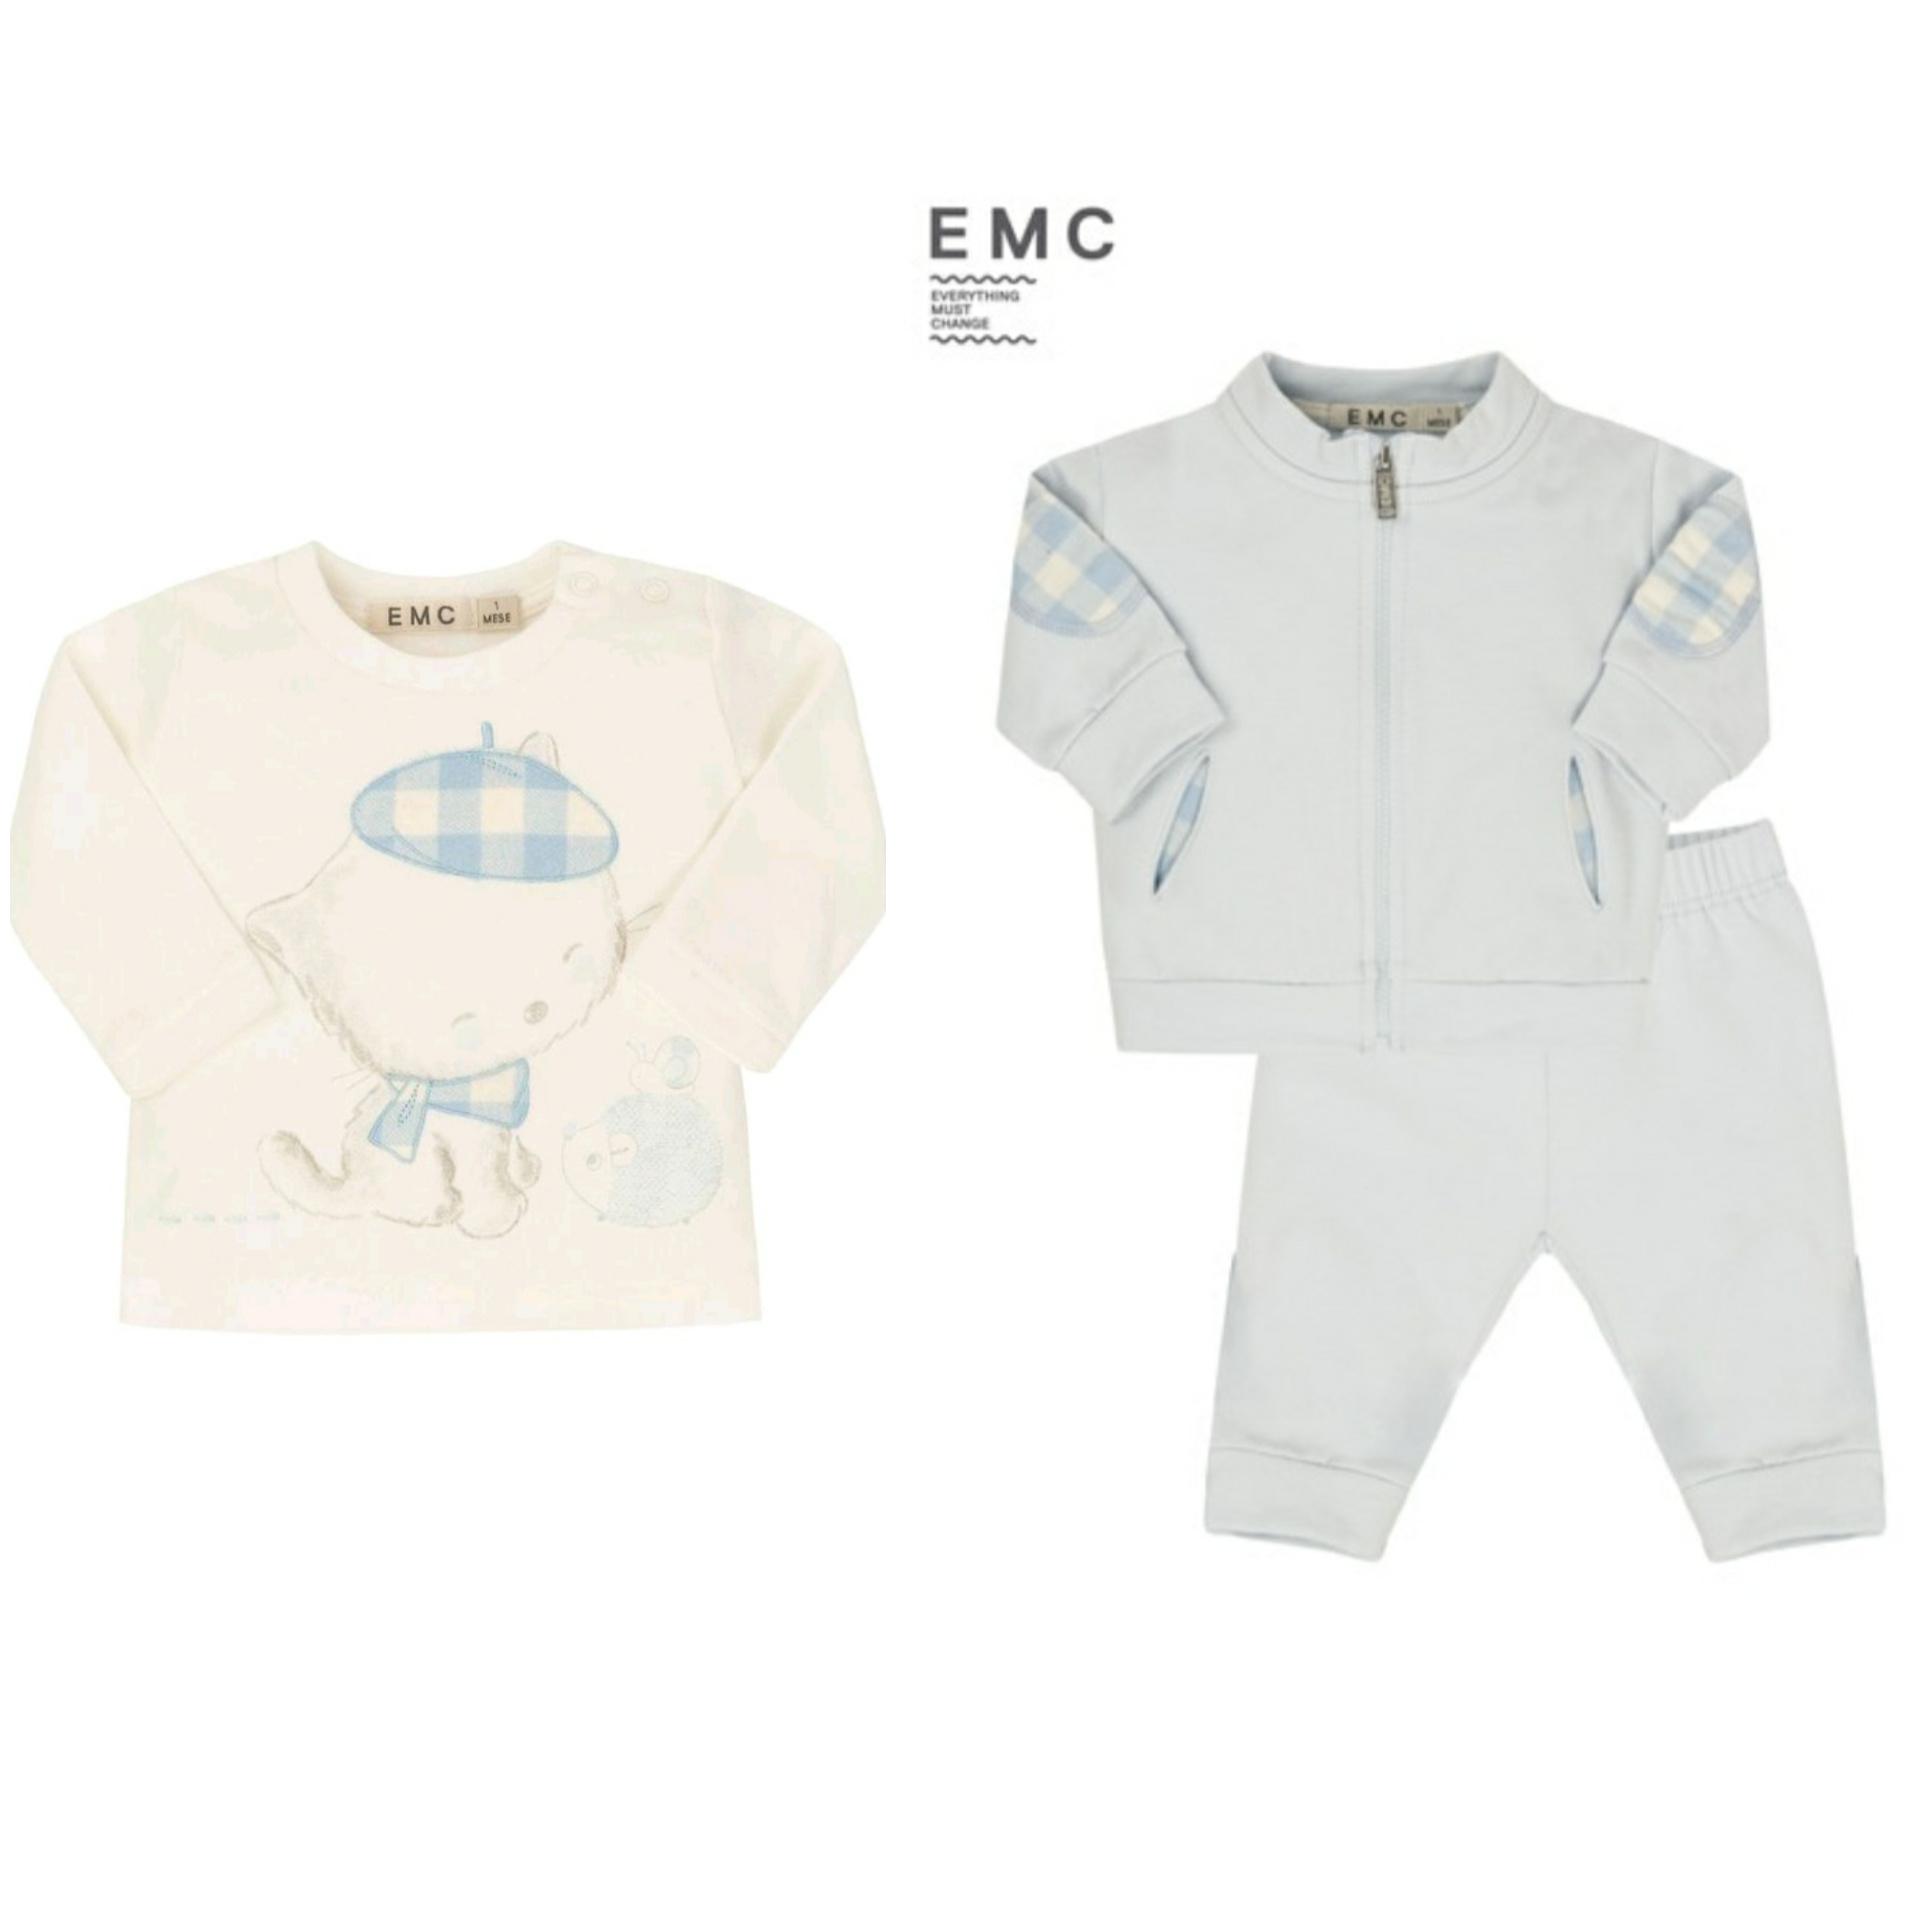 EMC EMC Boys Zip Tracksuit Set